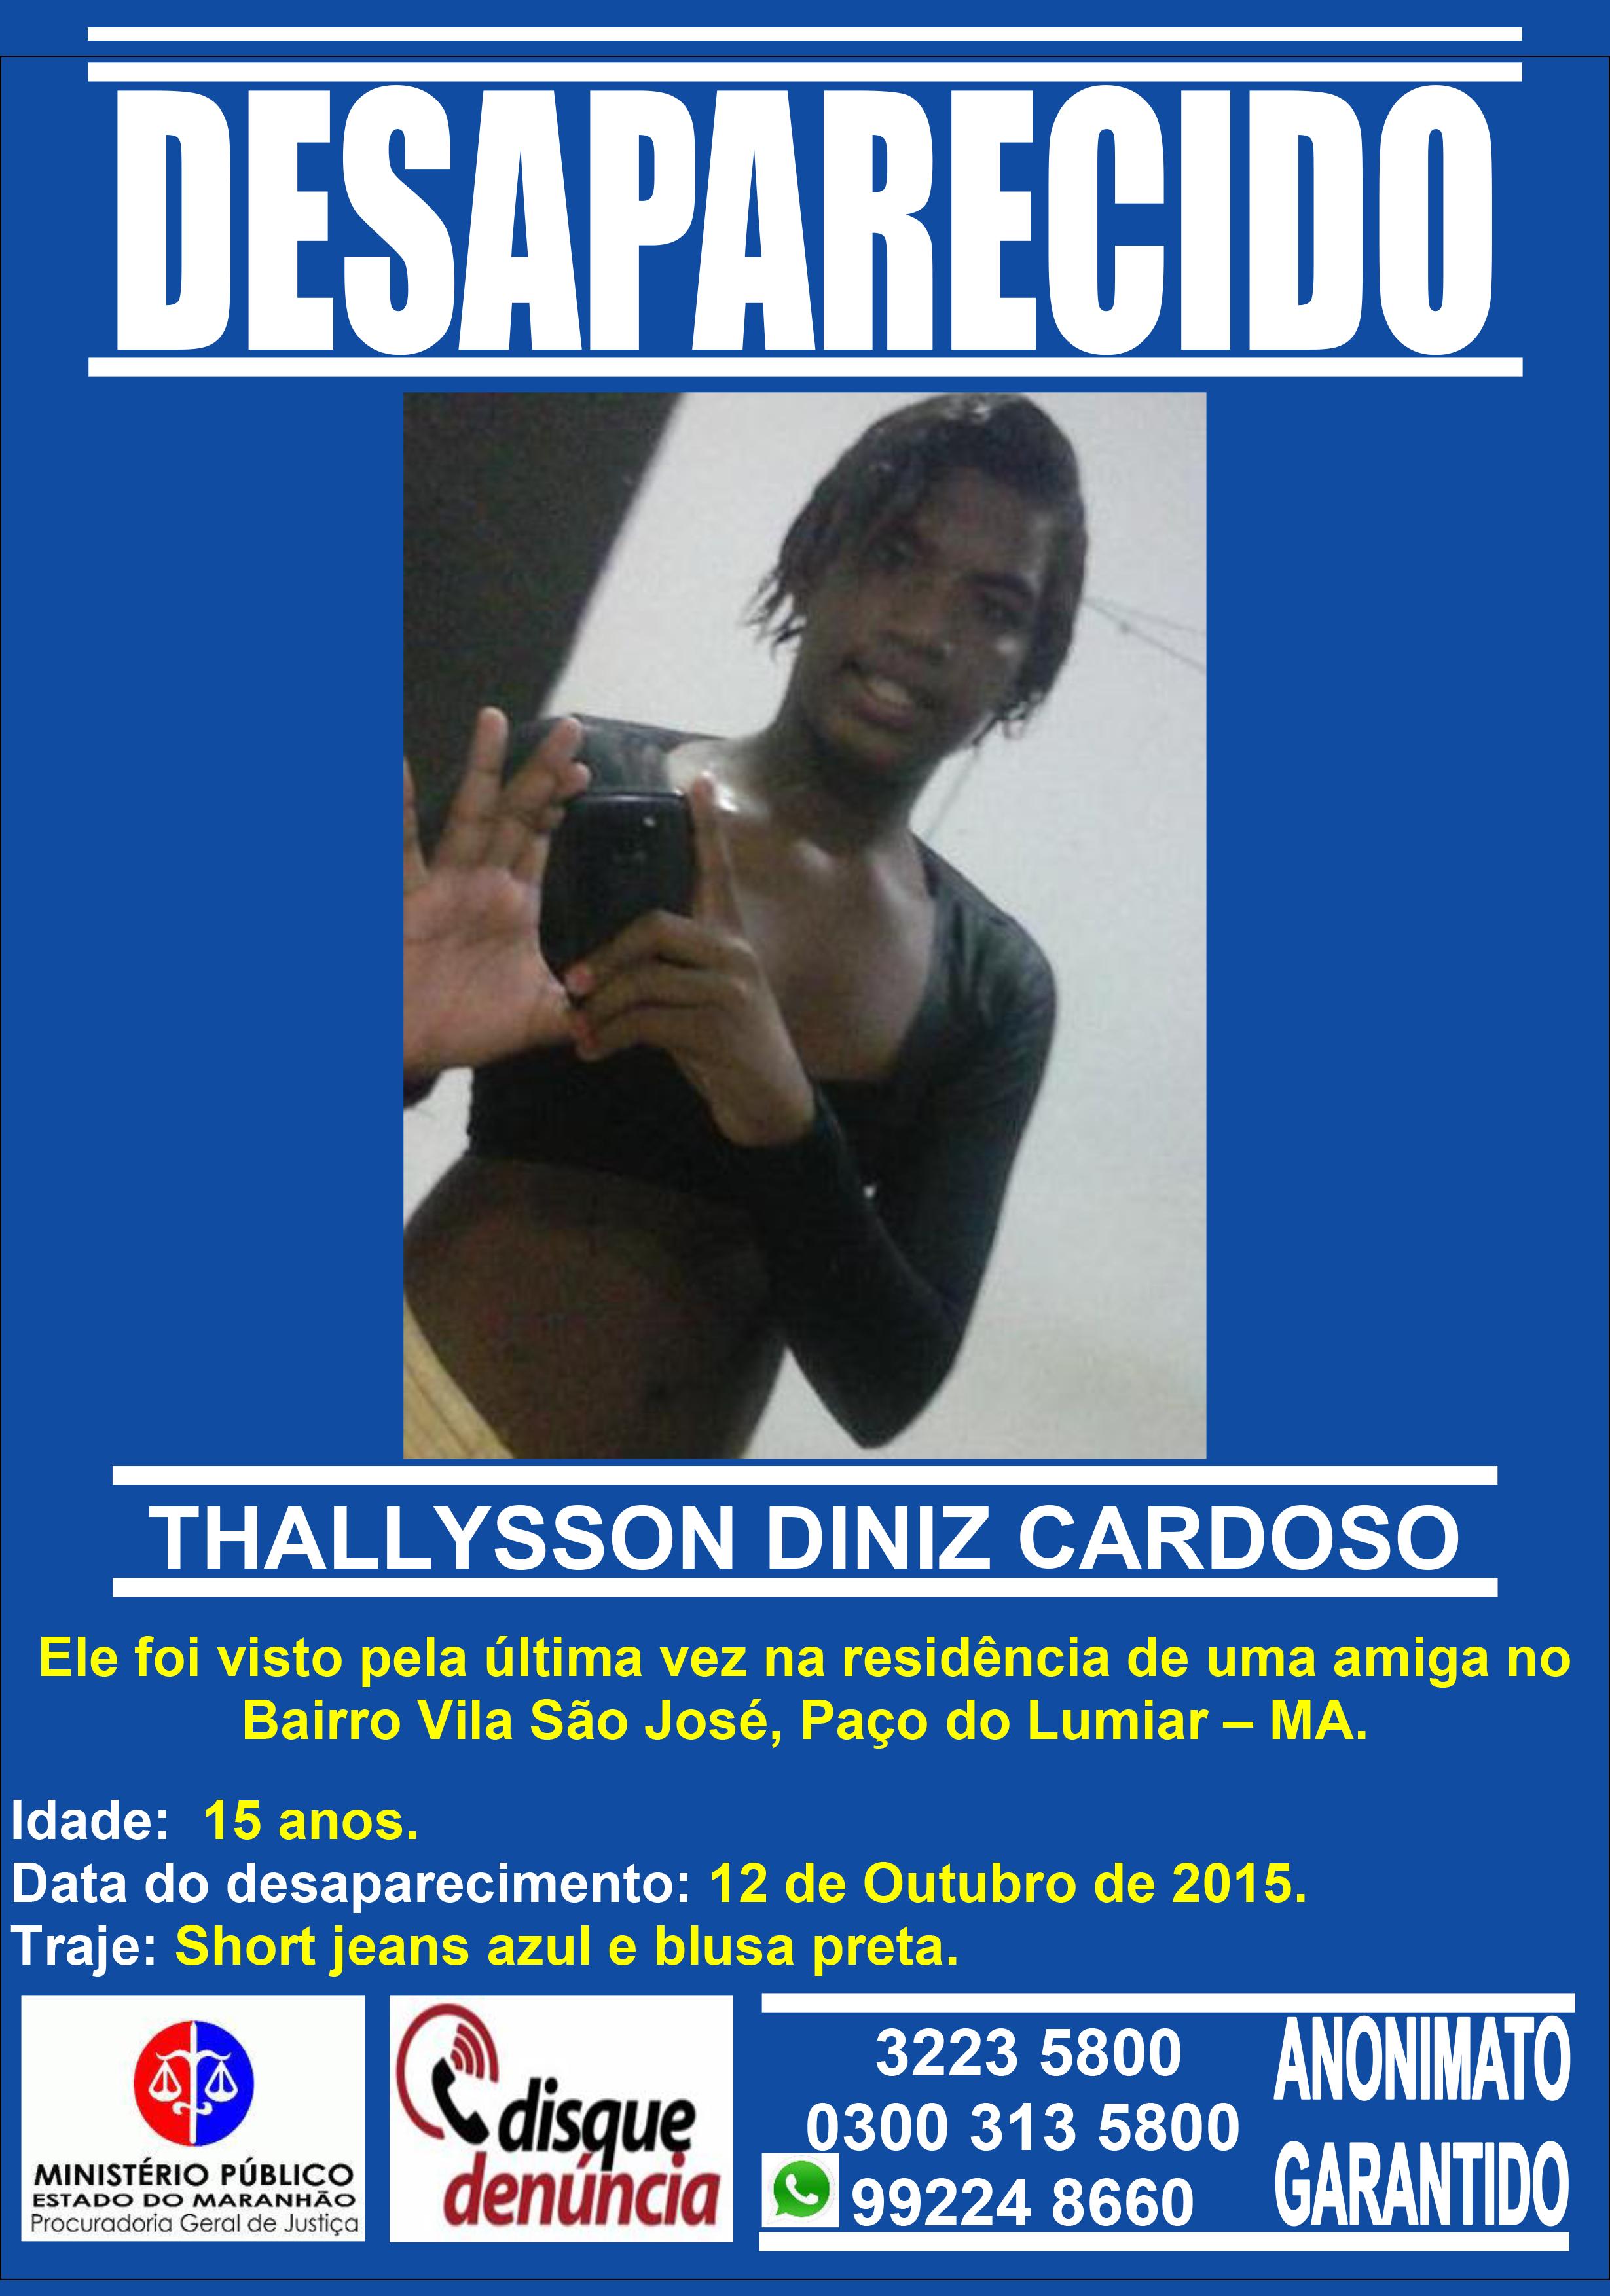 thallysson-diniz-cardoso.png